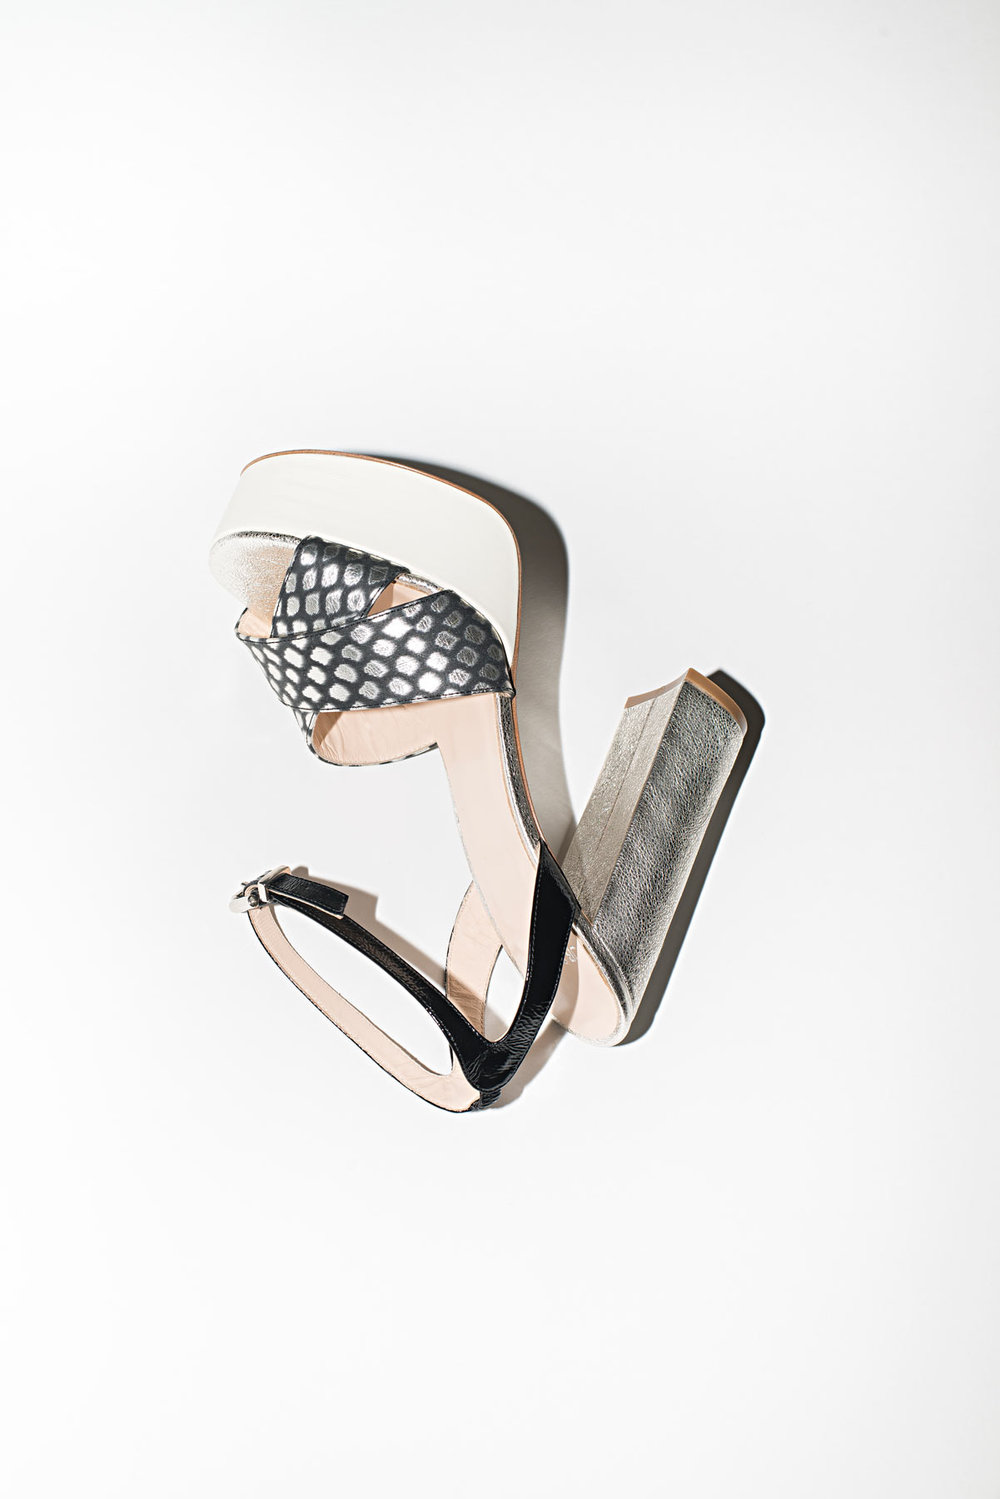 accessoire_chaussure_shoes_sac_bag_photo_photographe_nature_morte_paris_studio_photographie_eshop_sneacker_still_life_mode_luxe_122_jb_martin_02.jpg